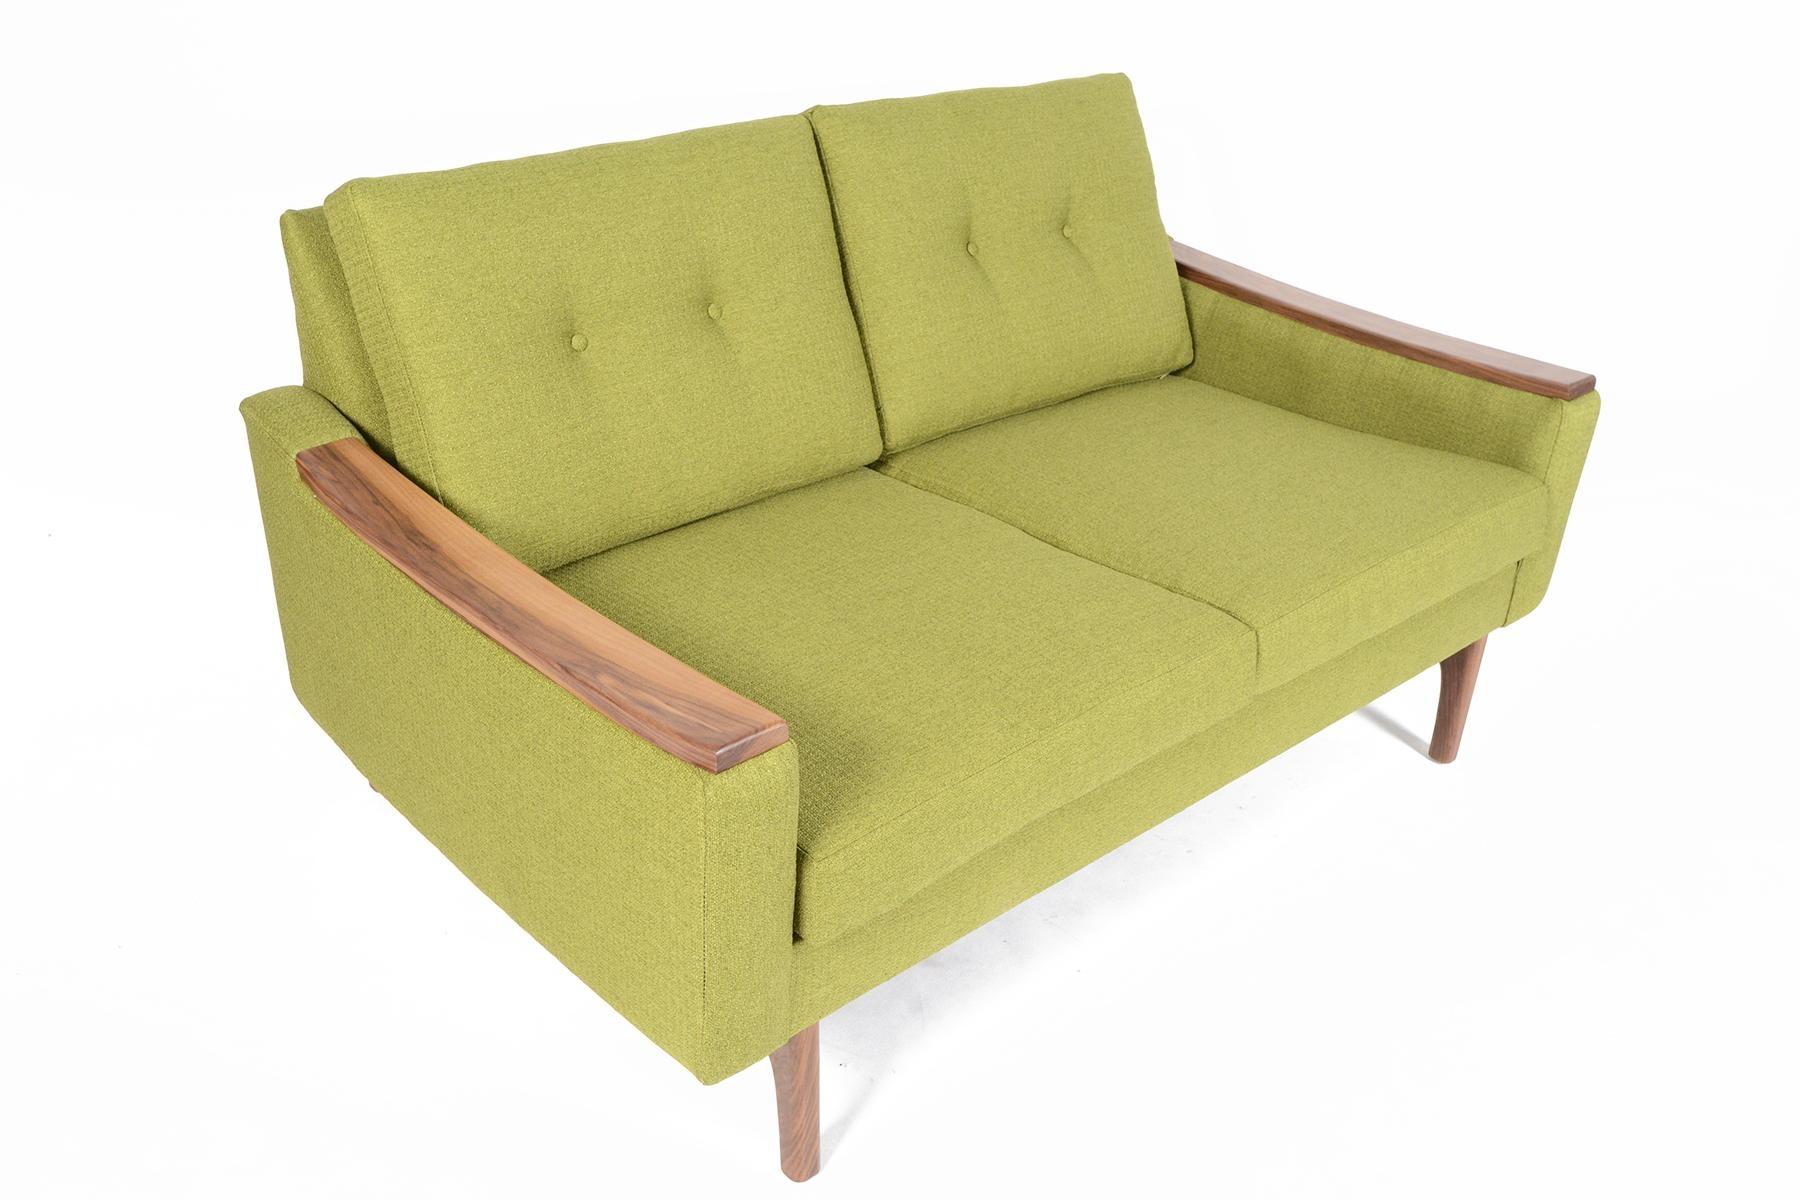 "Piedmont"" Mid Century Sofa | Mid Century Mobler In Piedmont Sofas (Image 18 of 20)"